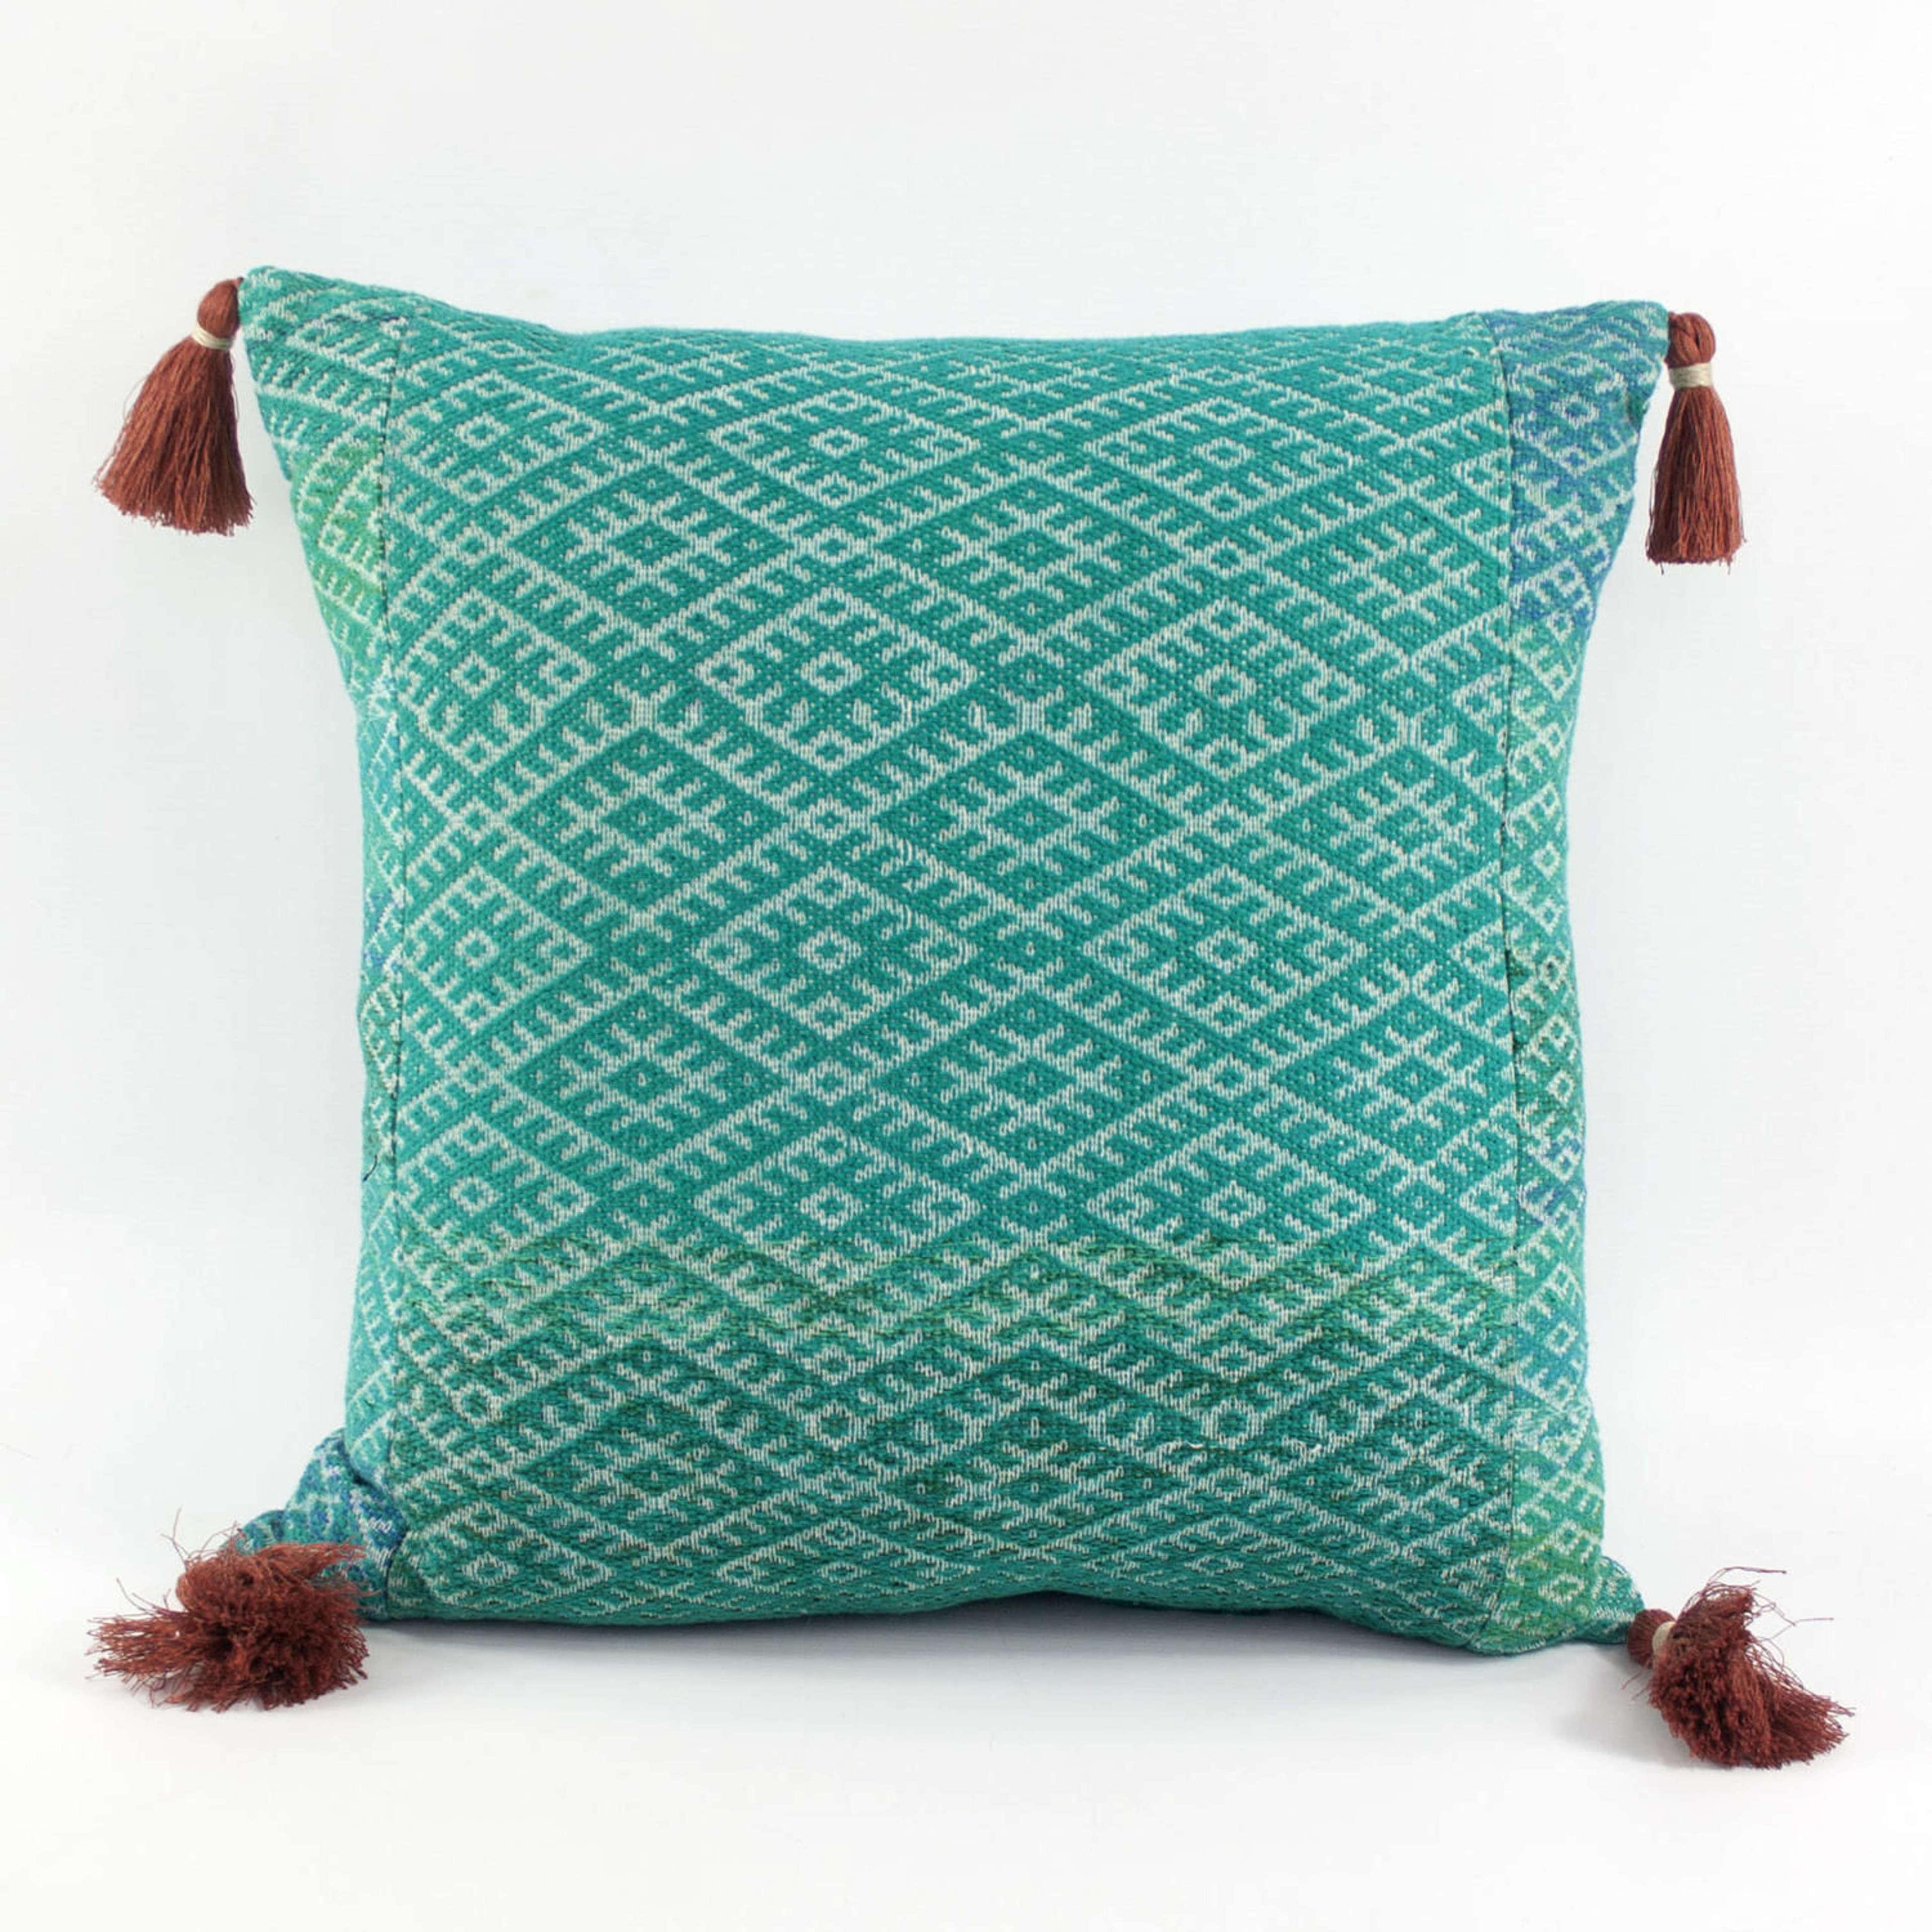 Turquoise Wedding Blanket Cushions